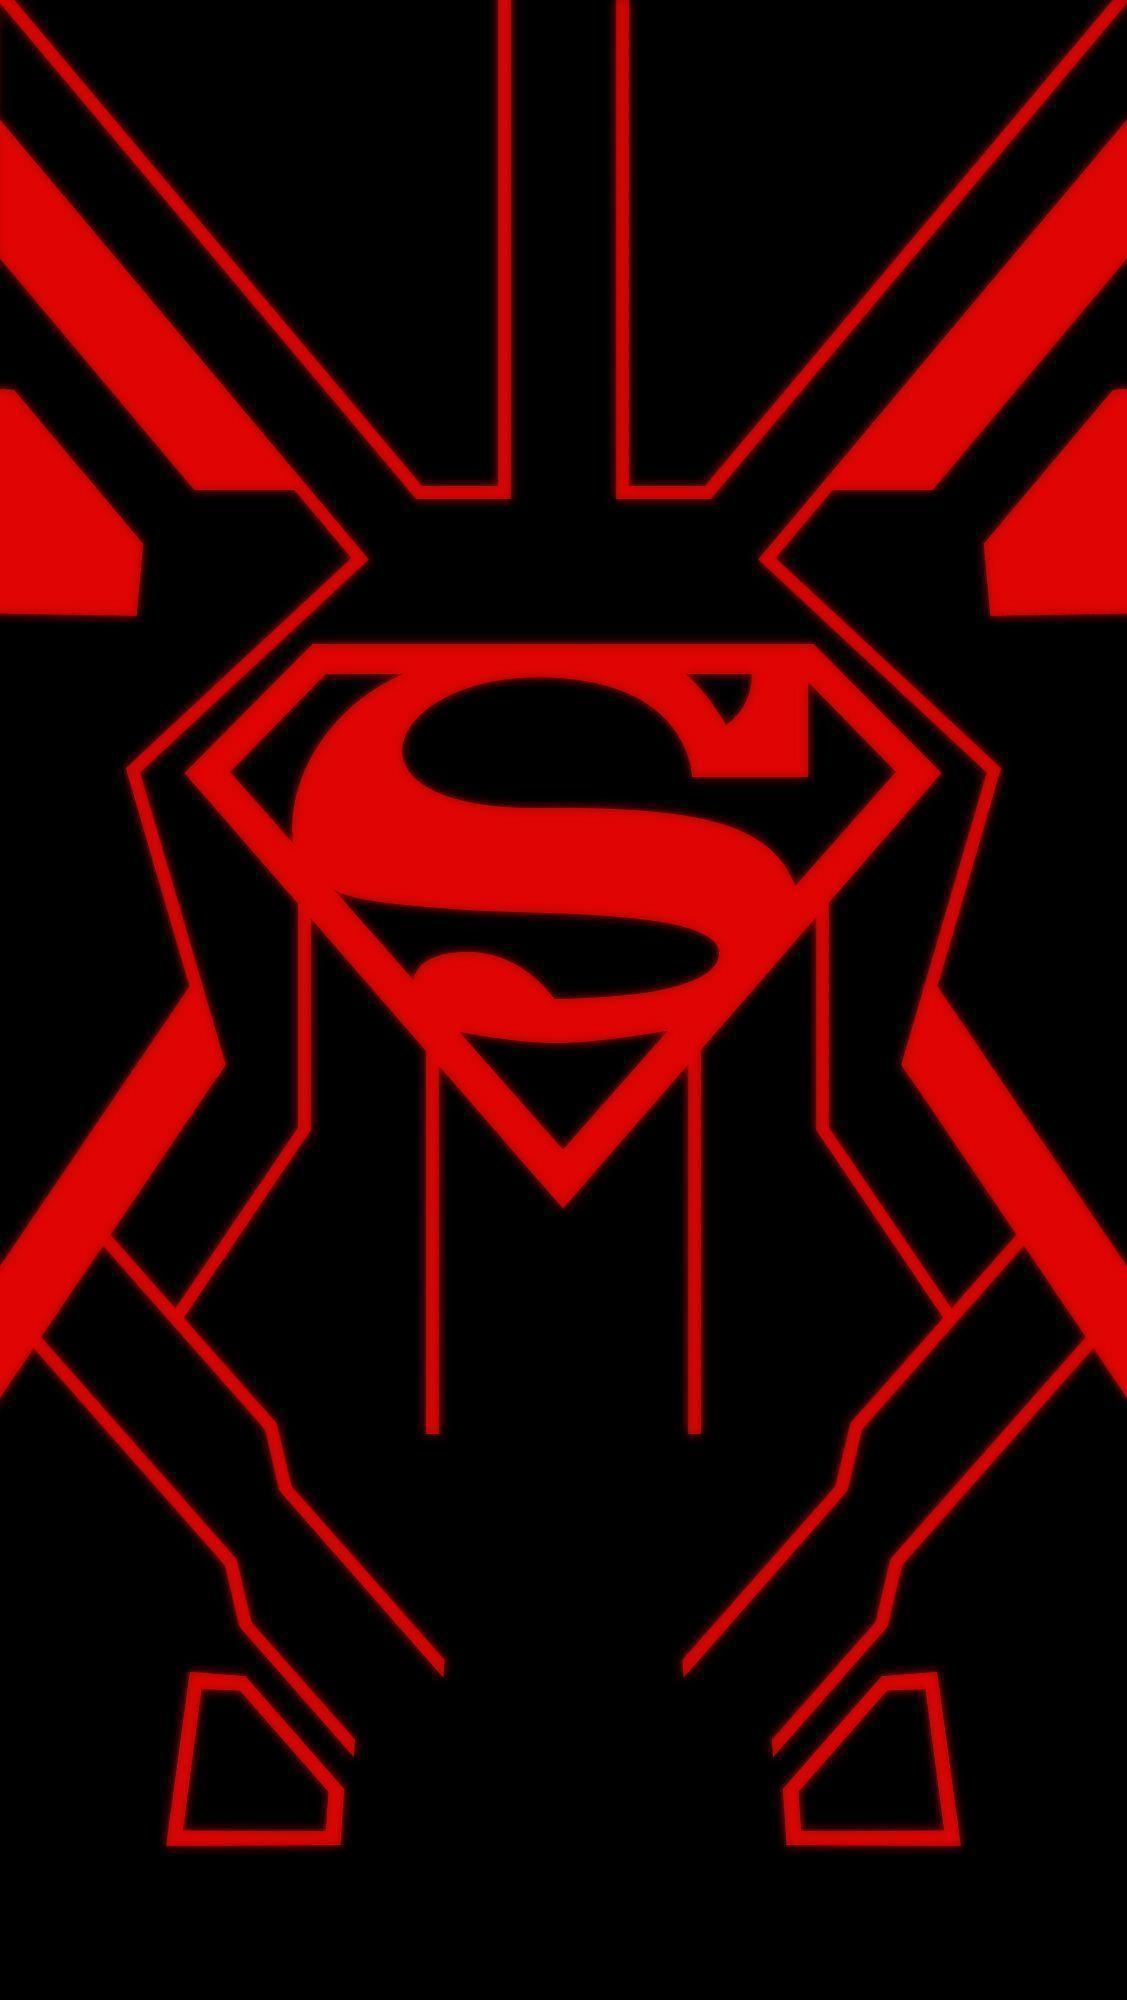 superman symbol wallpaper iphone